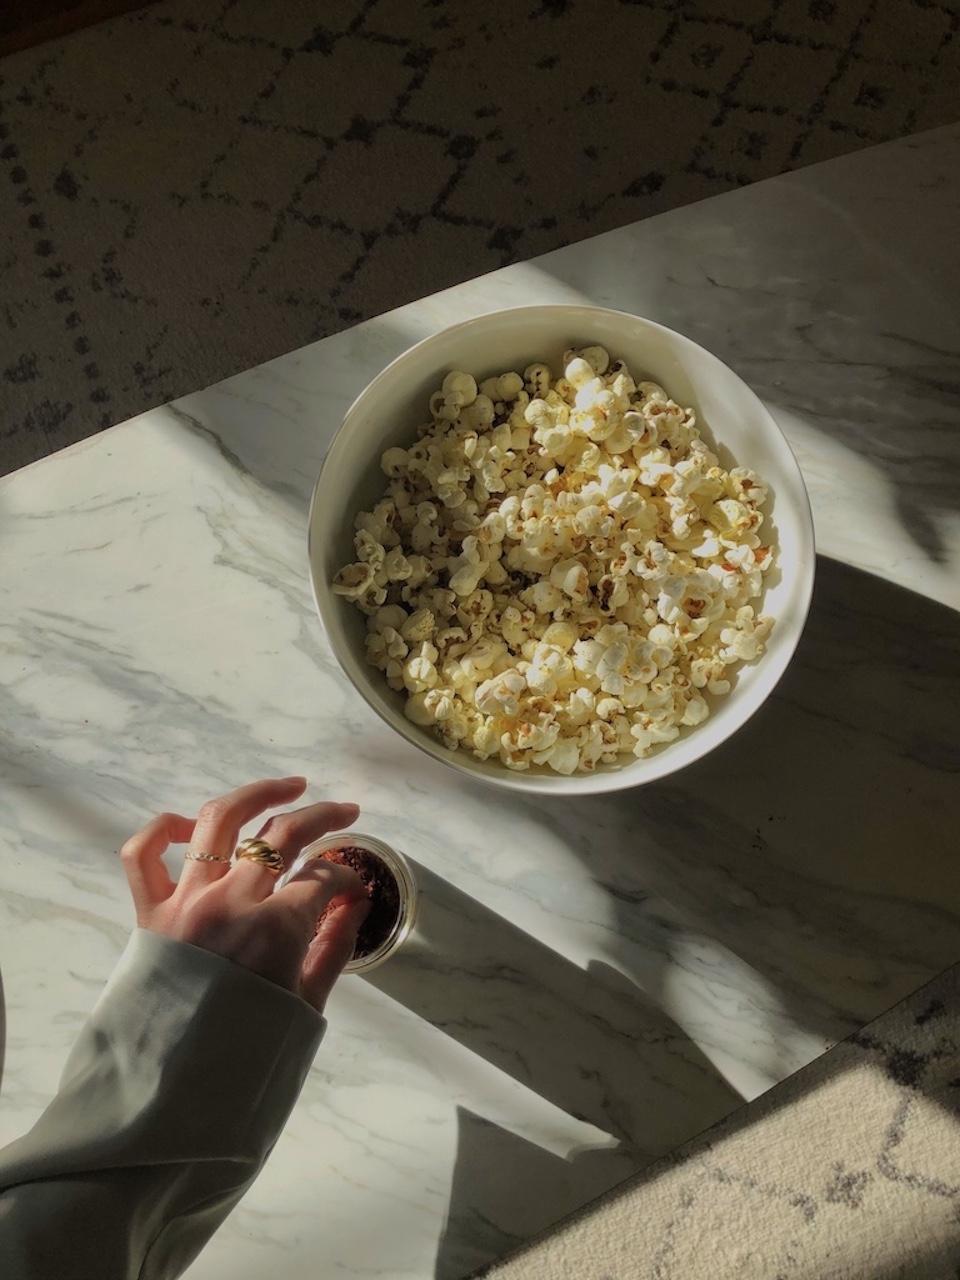 Alexandria_Yamazaki_Popcorn_2